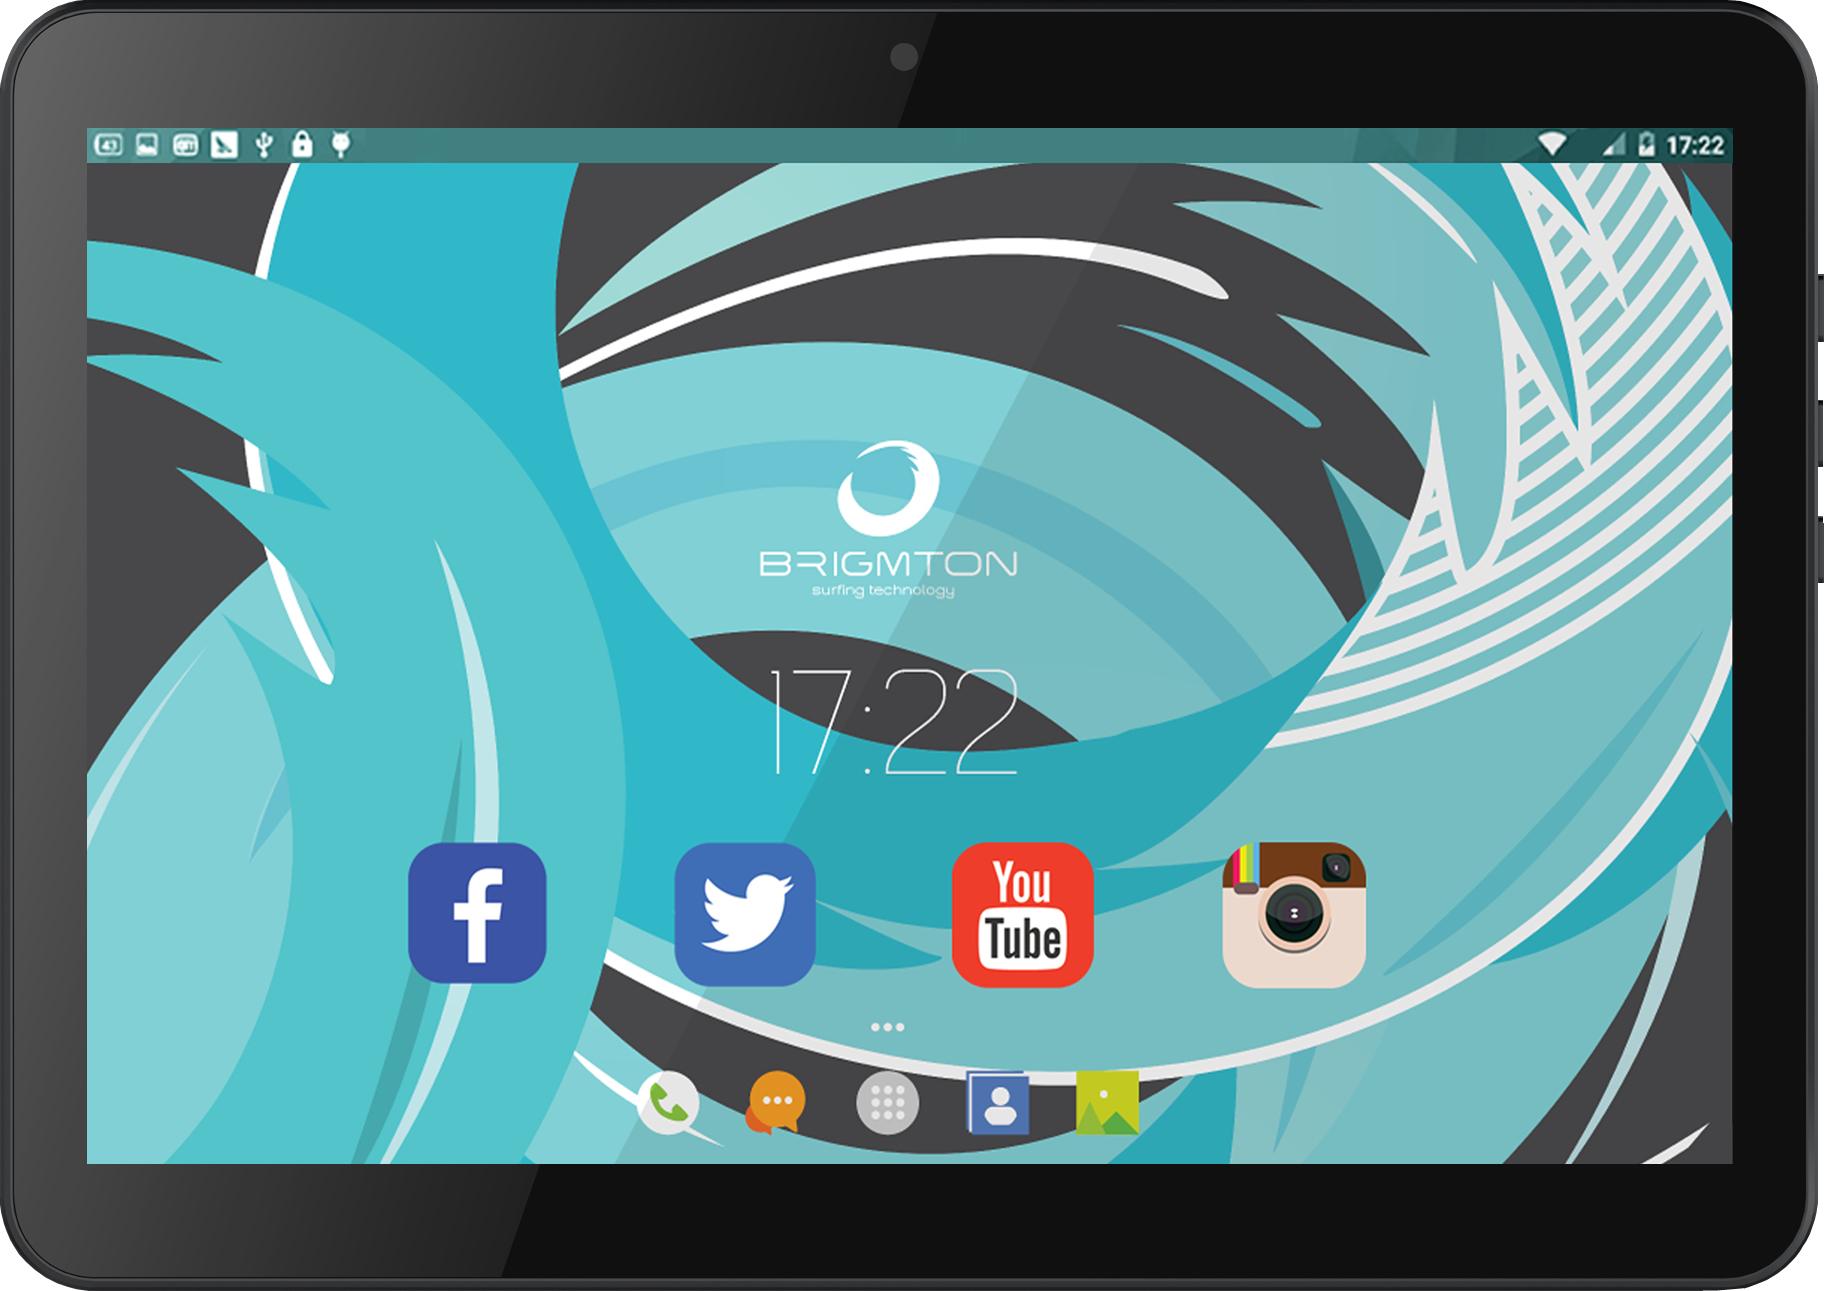 Brigmton BTPC-1021QC3G 16GB 3G Nero tablet 8425081017013  02_S0402585